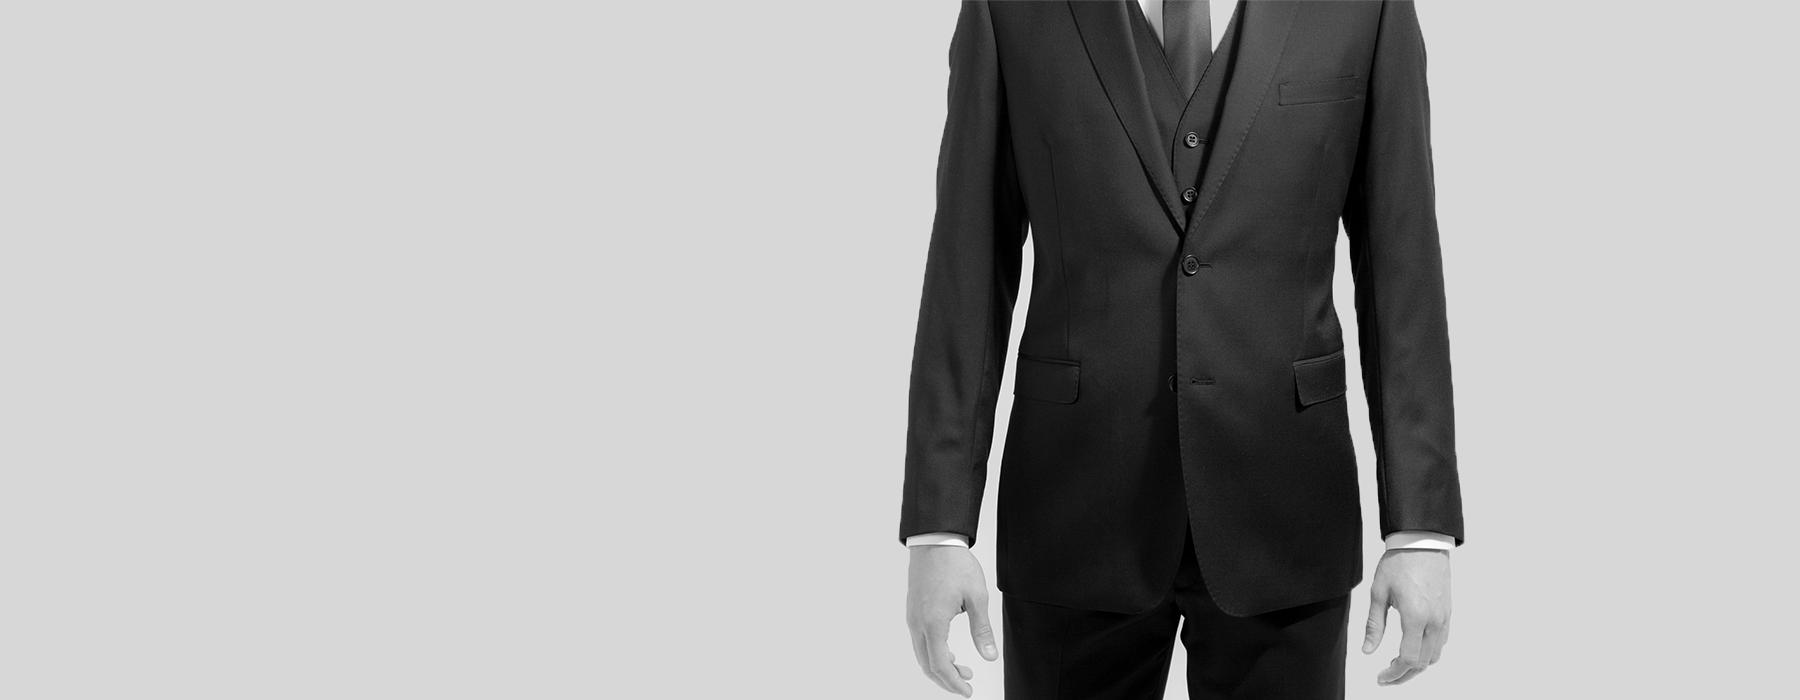 Rundle Tailoring Tips – Men's Fashion Faux Pas